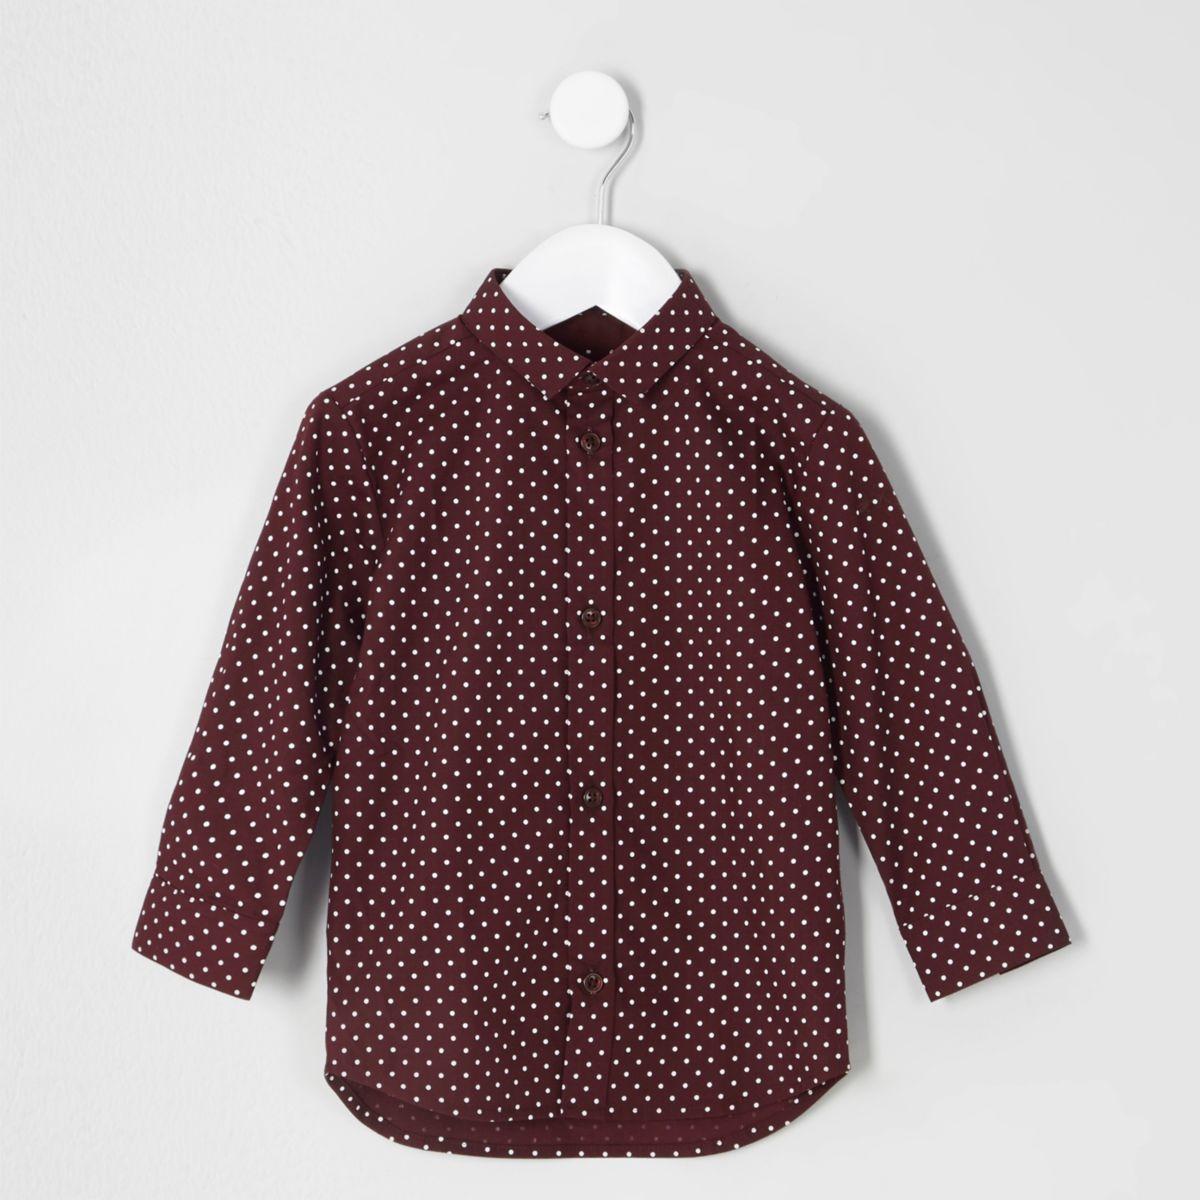 Mini boys burgundy polka dot shirt